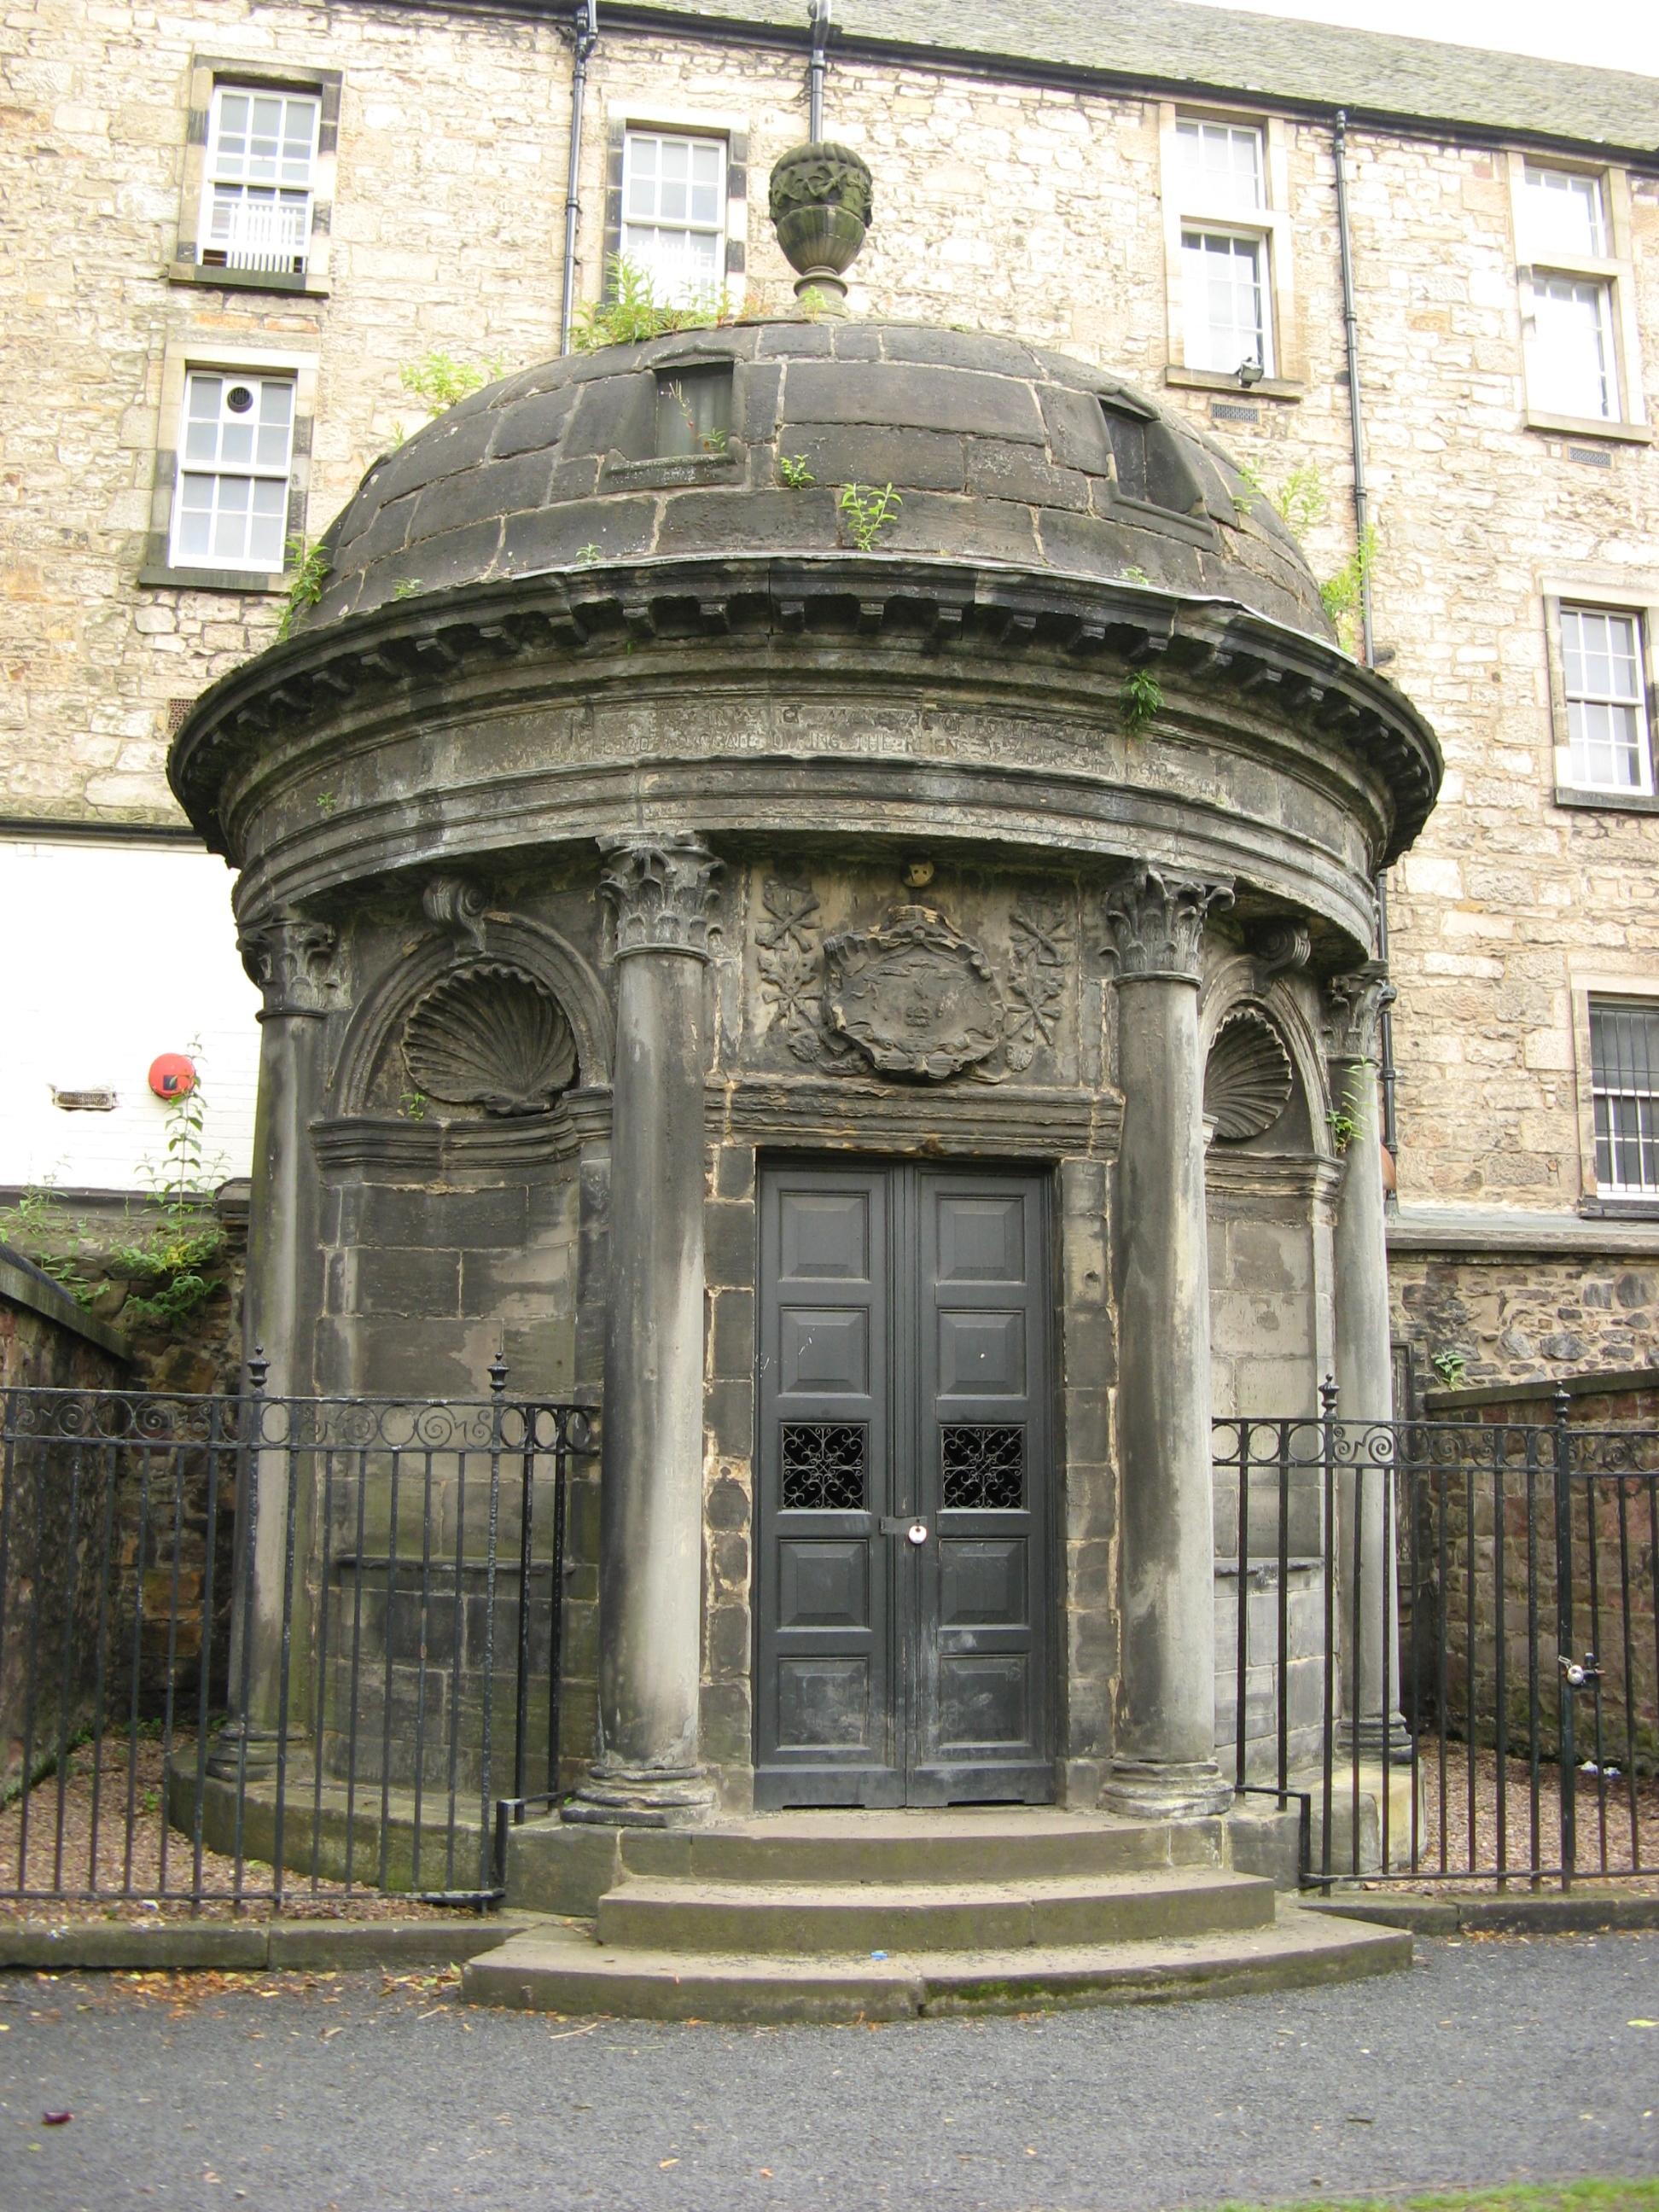 File:Mackenzie mausoleum.JPG - Wikimedia Commons